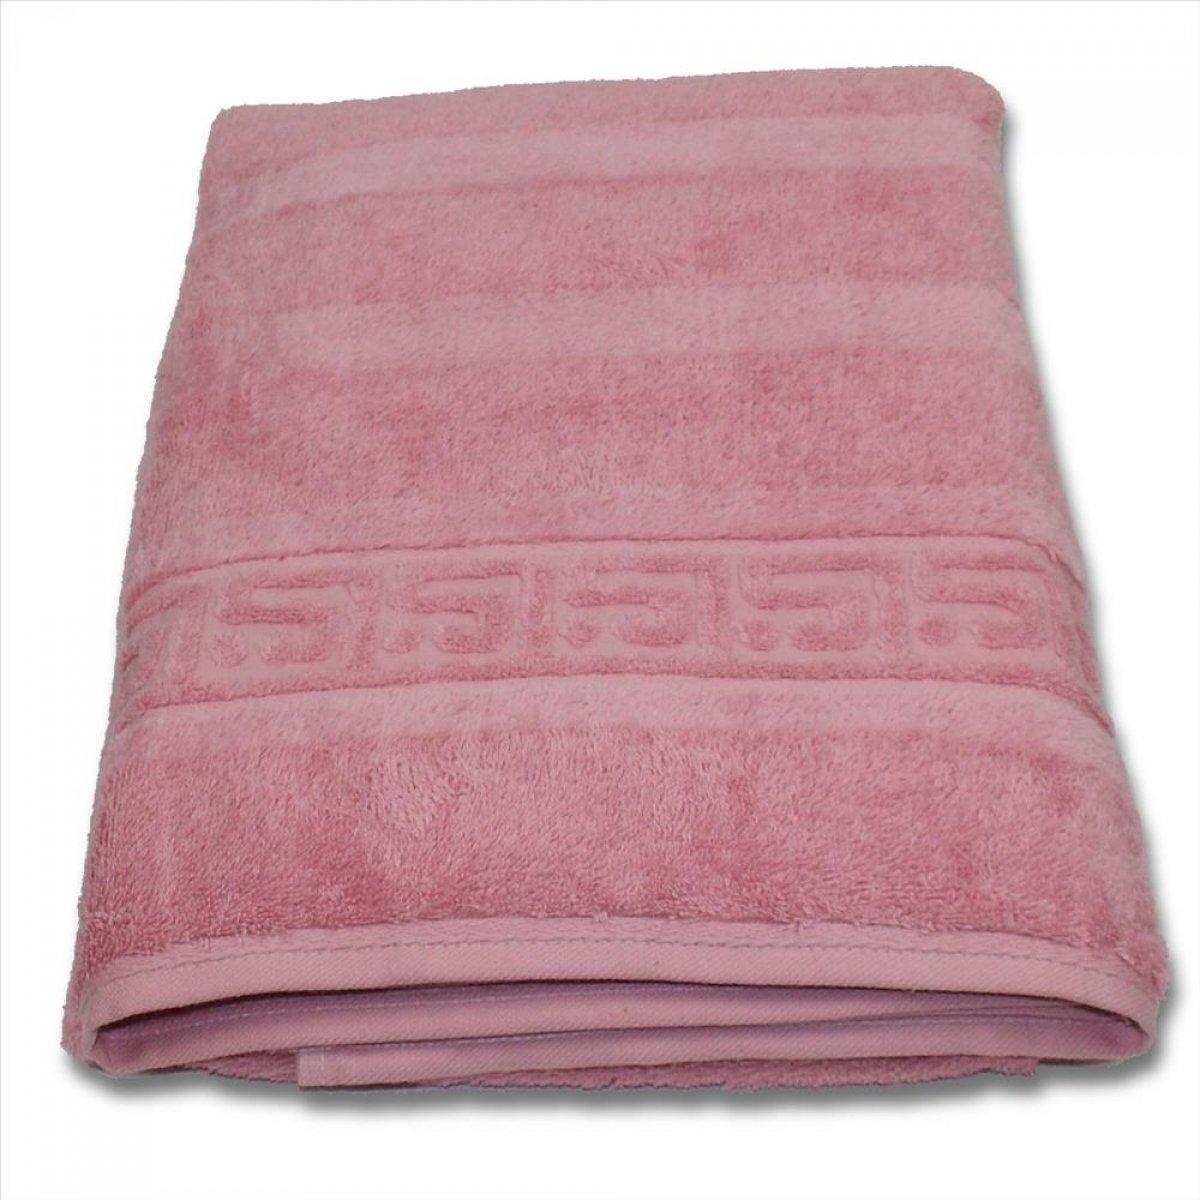 Cawö Noblesse2 Uni 1002 - Toalla de mano, 100 % algodón, arena, 16x22